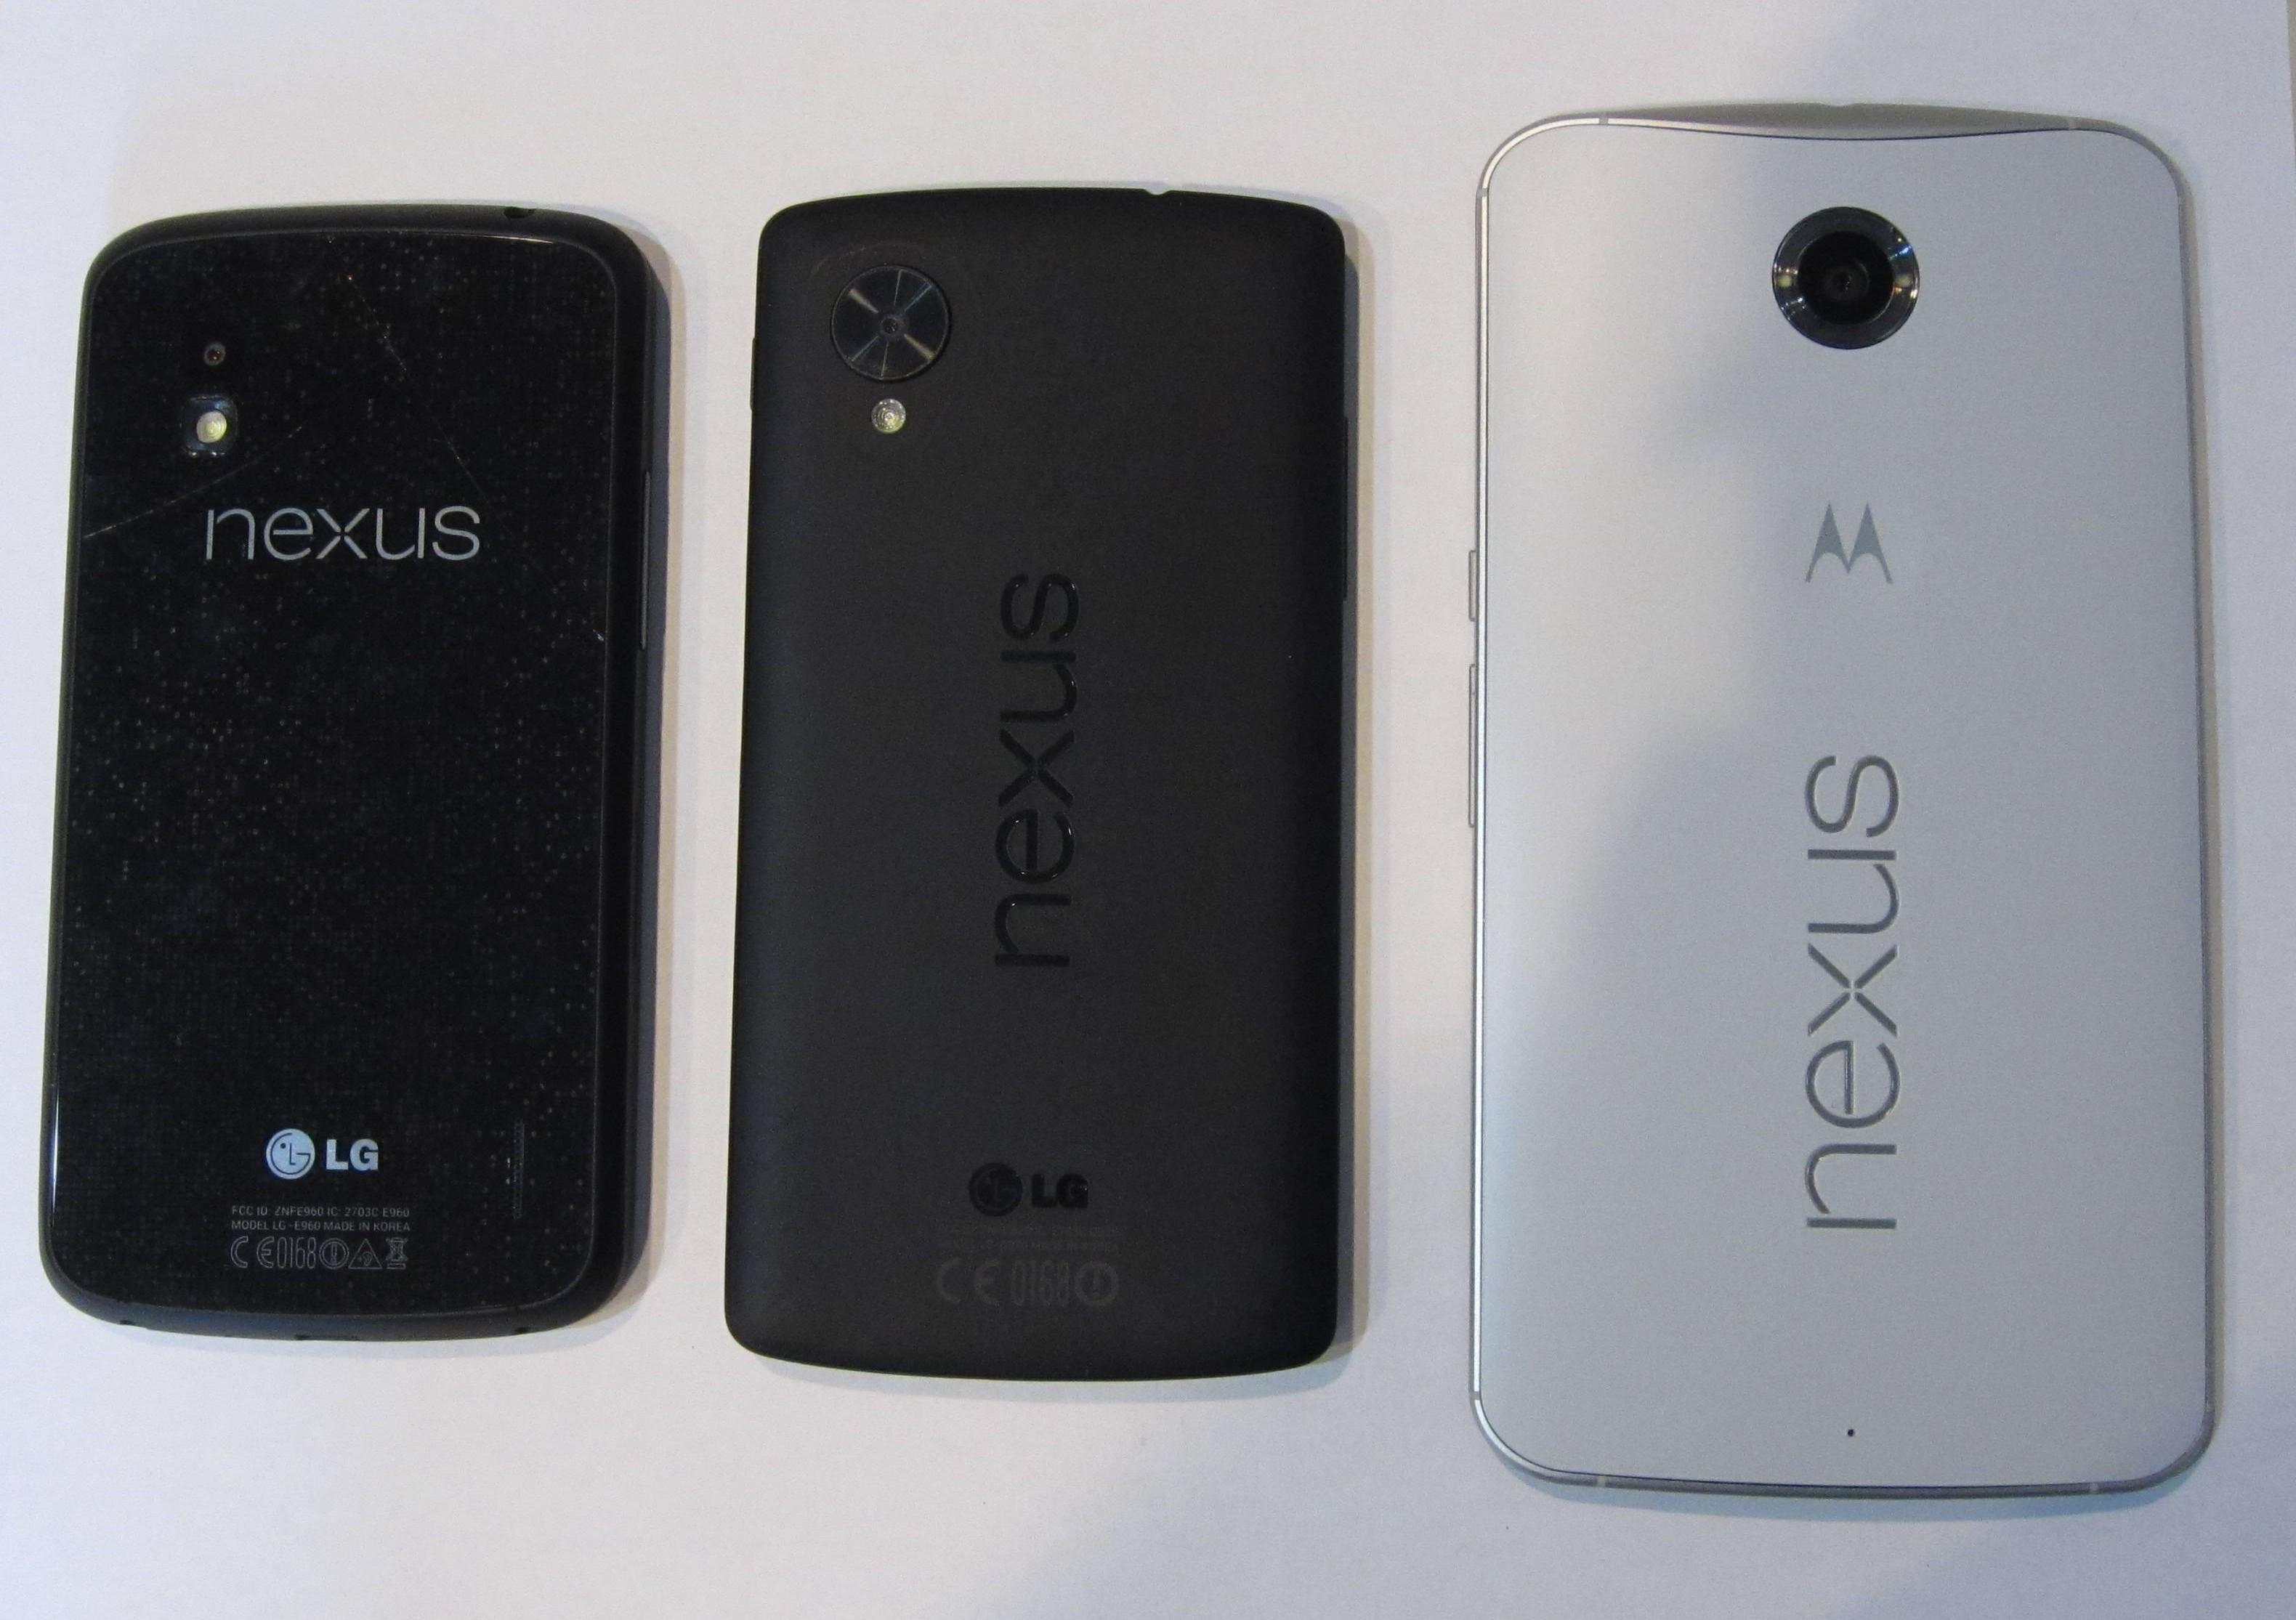 load-the-game-nexus-4-vs-nexus-5-vs-nexus-6